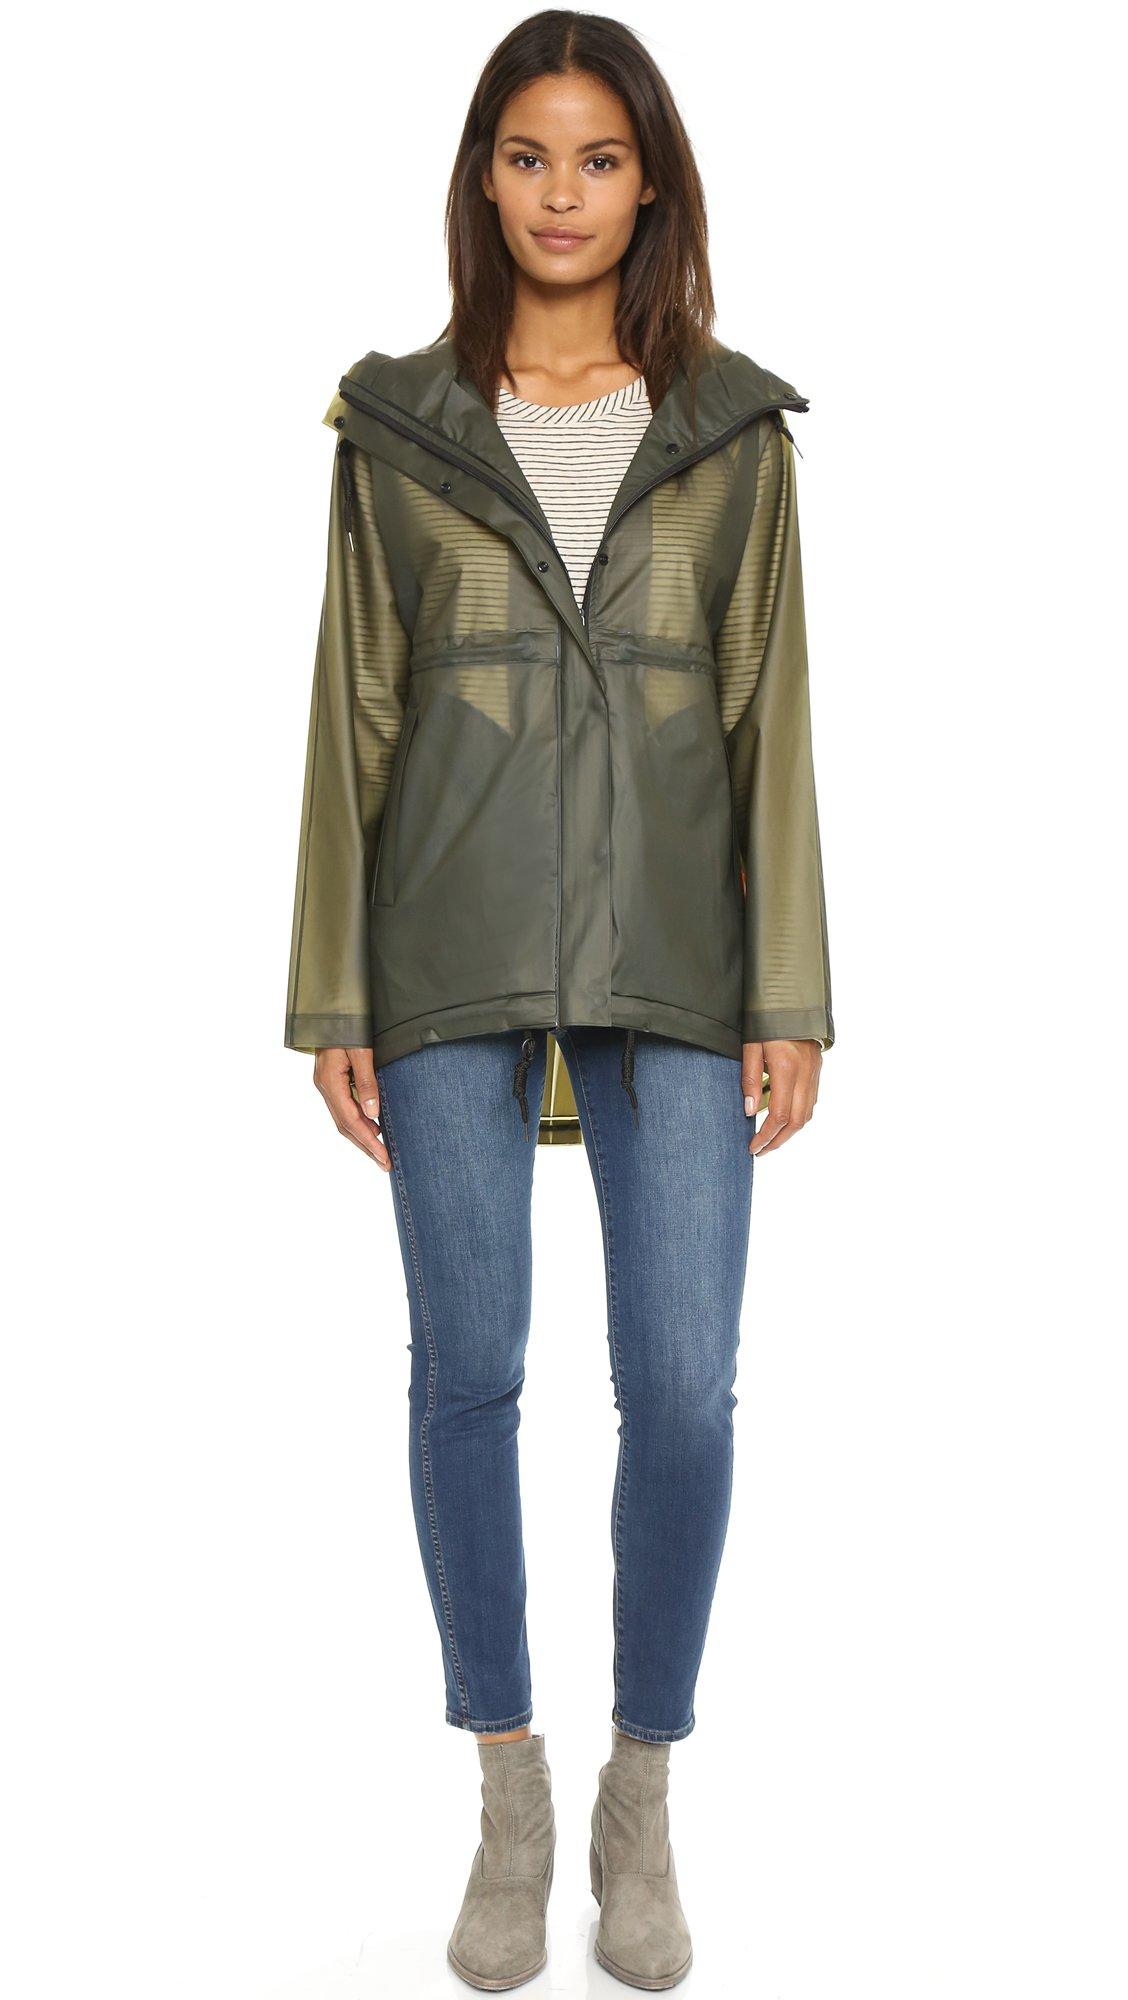 Womens hunter jackets